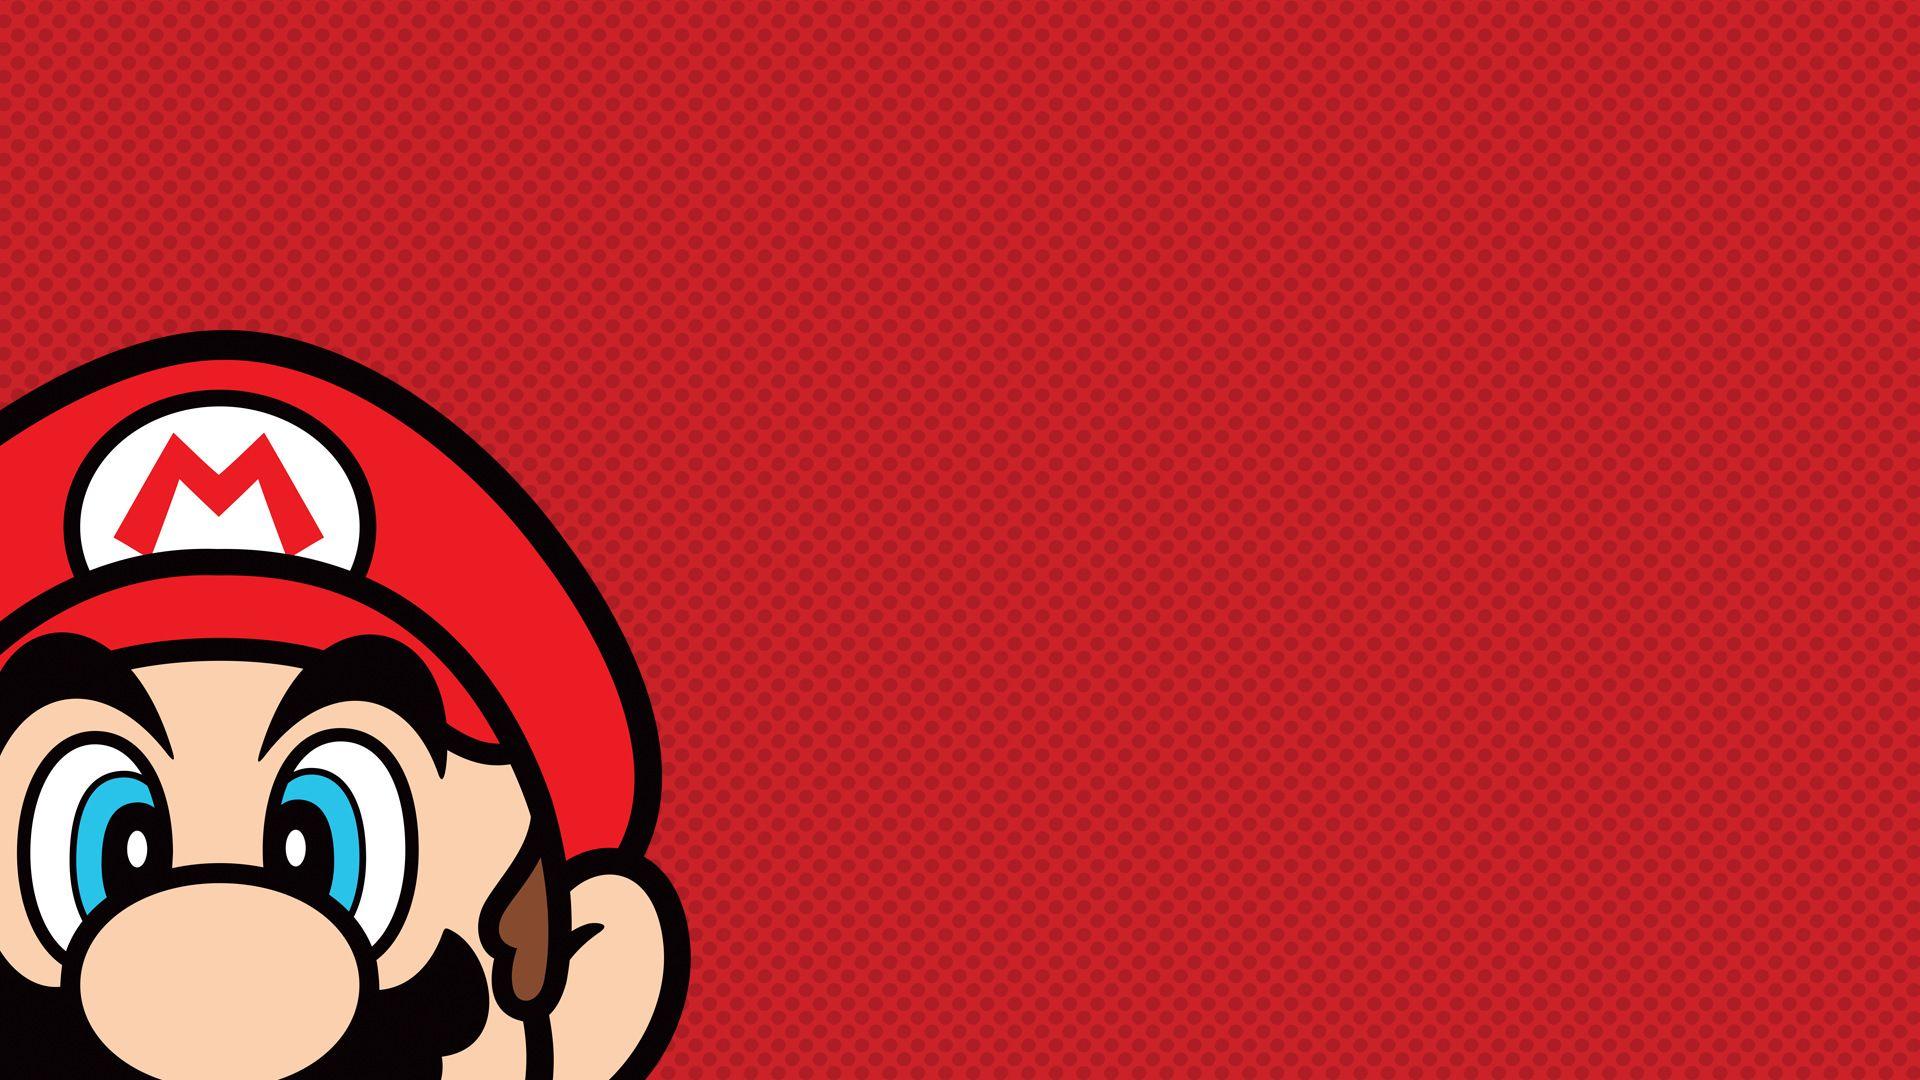 Nintendo Wallpapers   Top Nintendo Backgrounds   WallpaperAccess 1920x1080